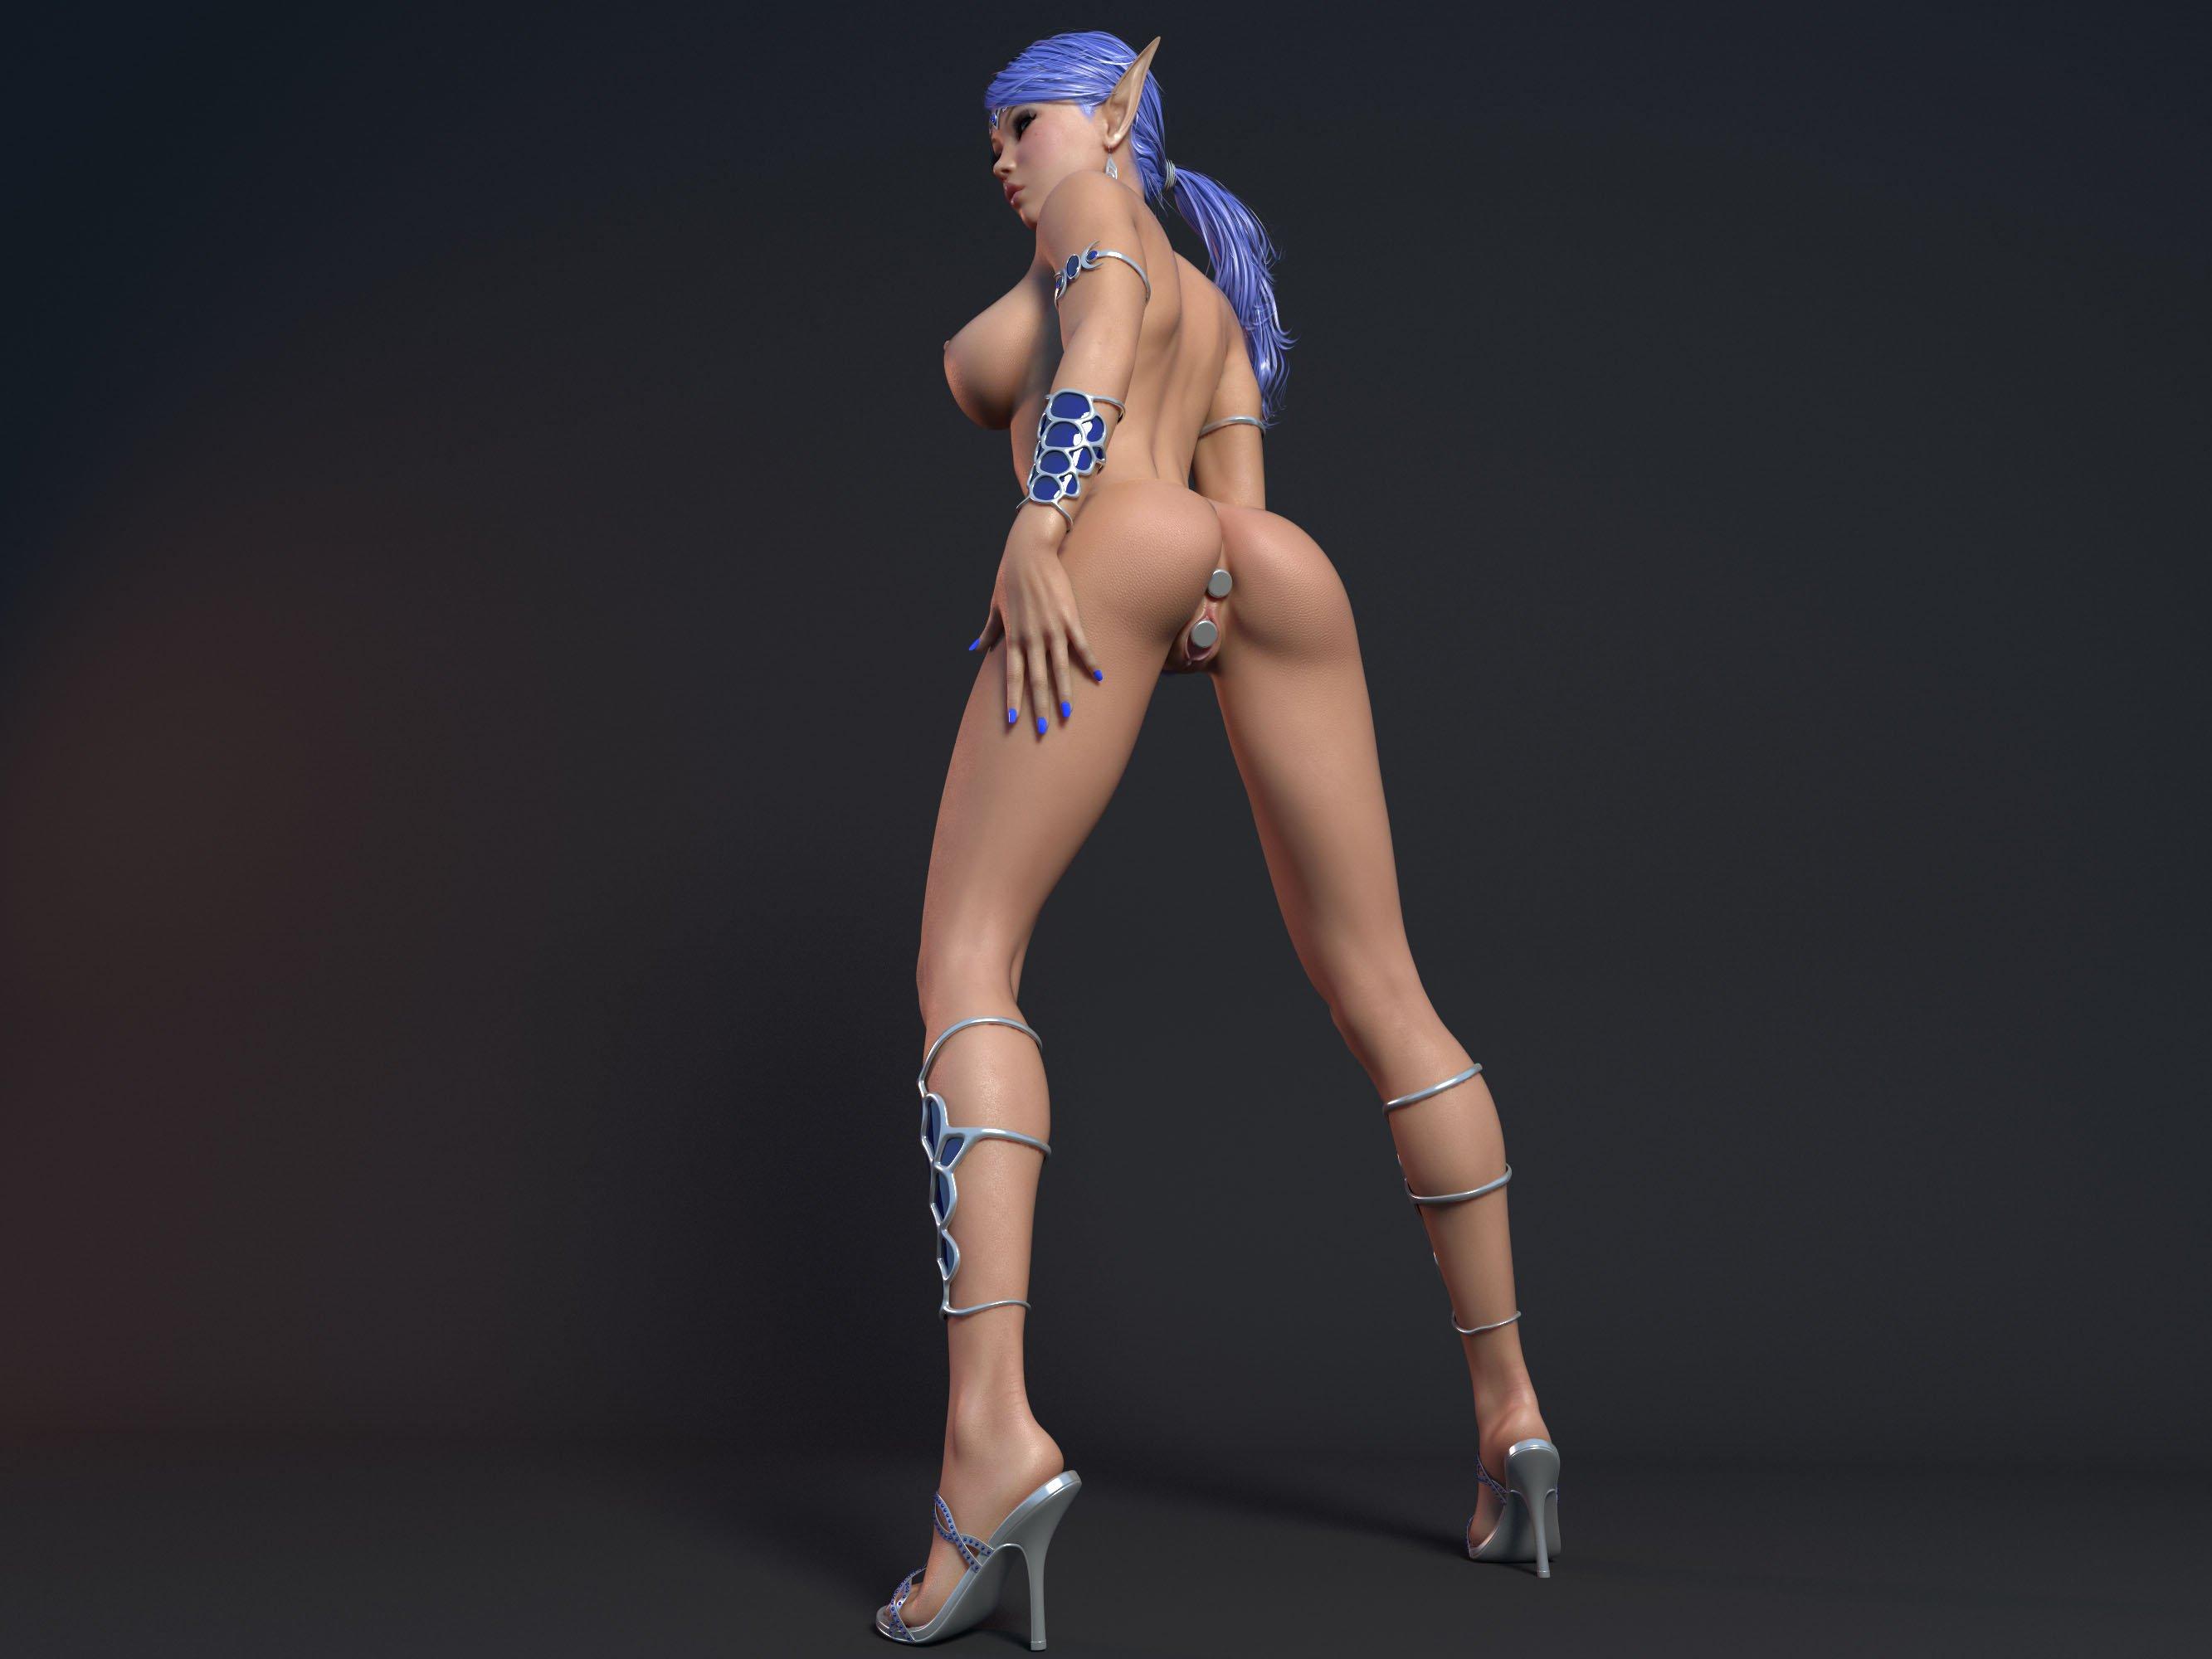 Elf victoria nude pics fucking girlfriends